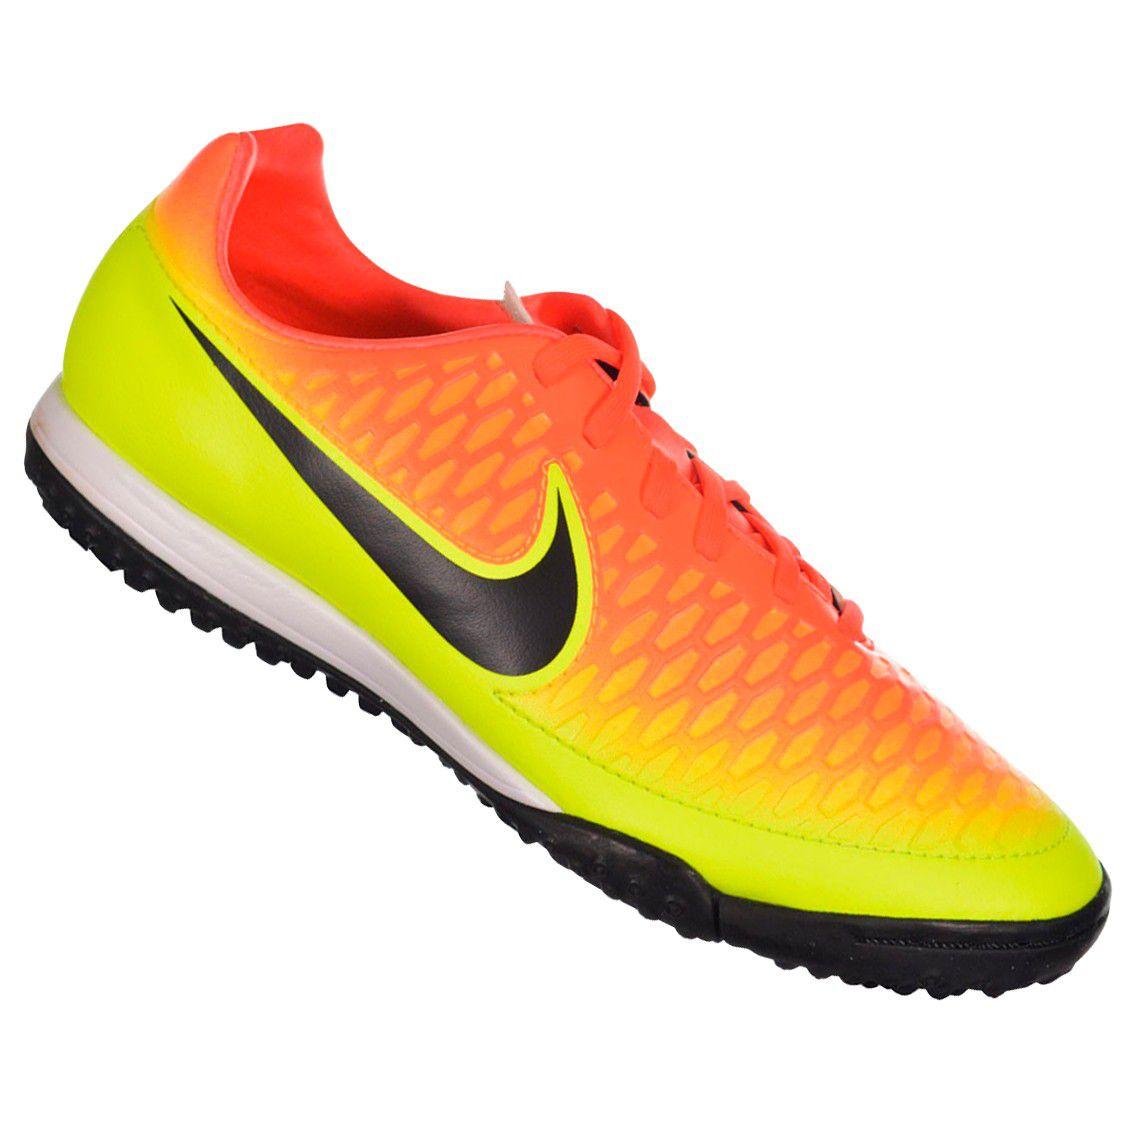 6d82c80567 Chuteira Nike Magista Onda Society Ref.651549-807 - Sportland